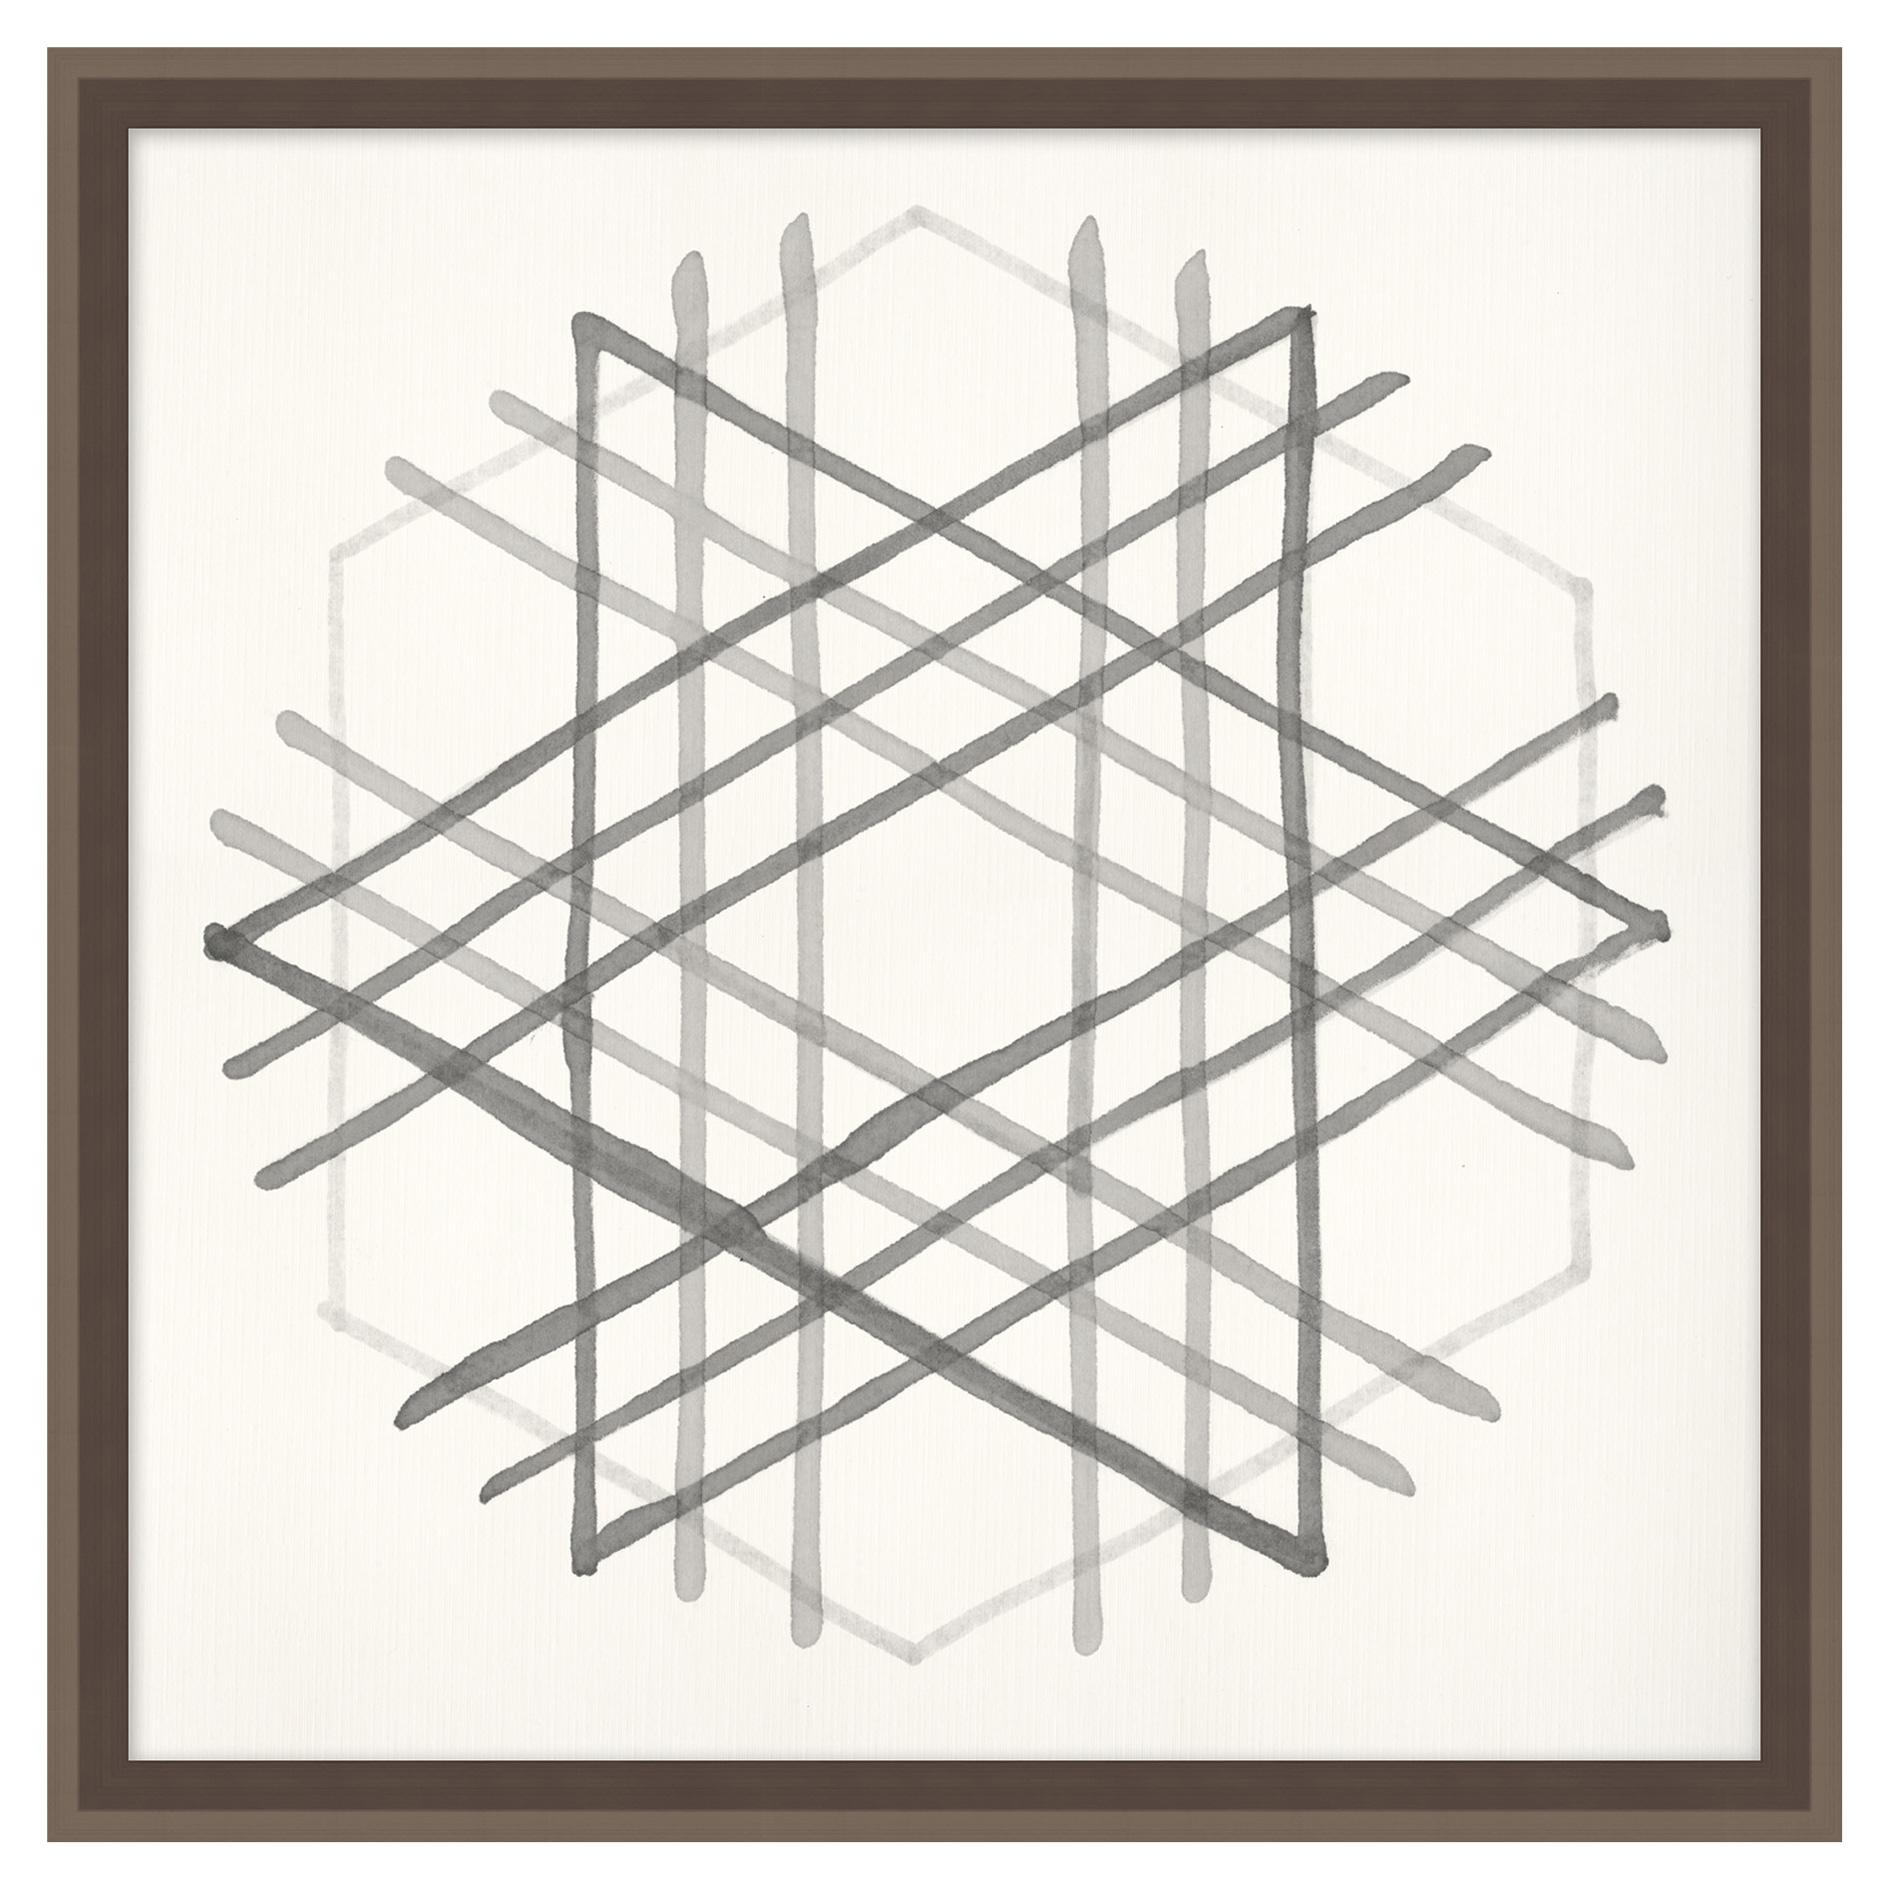 Geometry Cross Hatch Soft Grey Contermporary Art